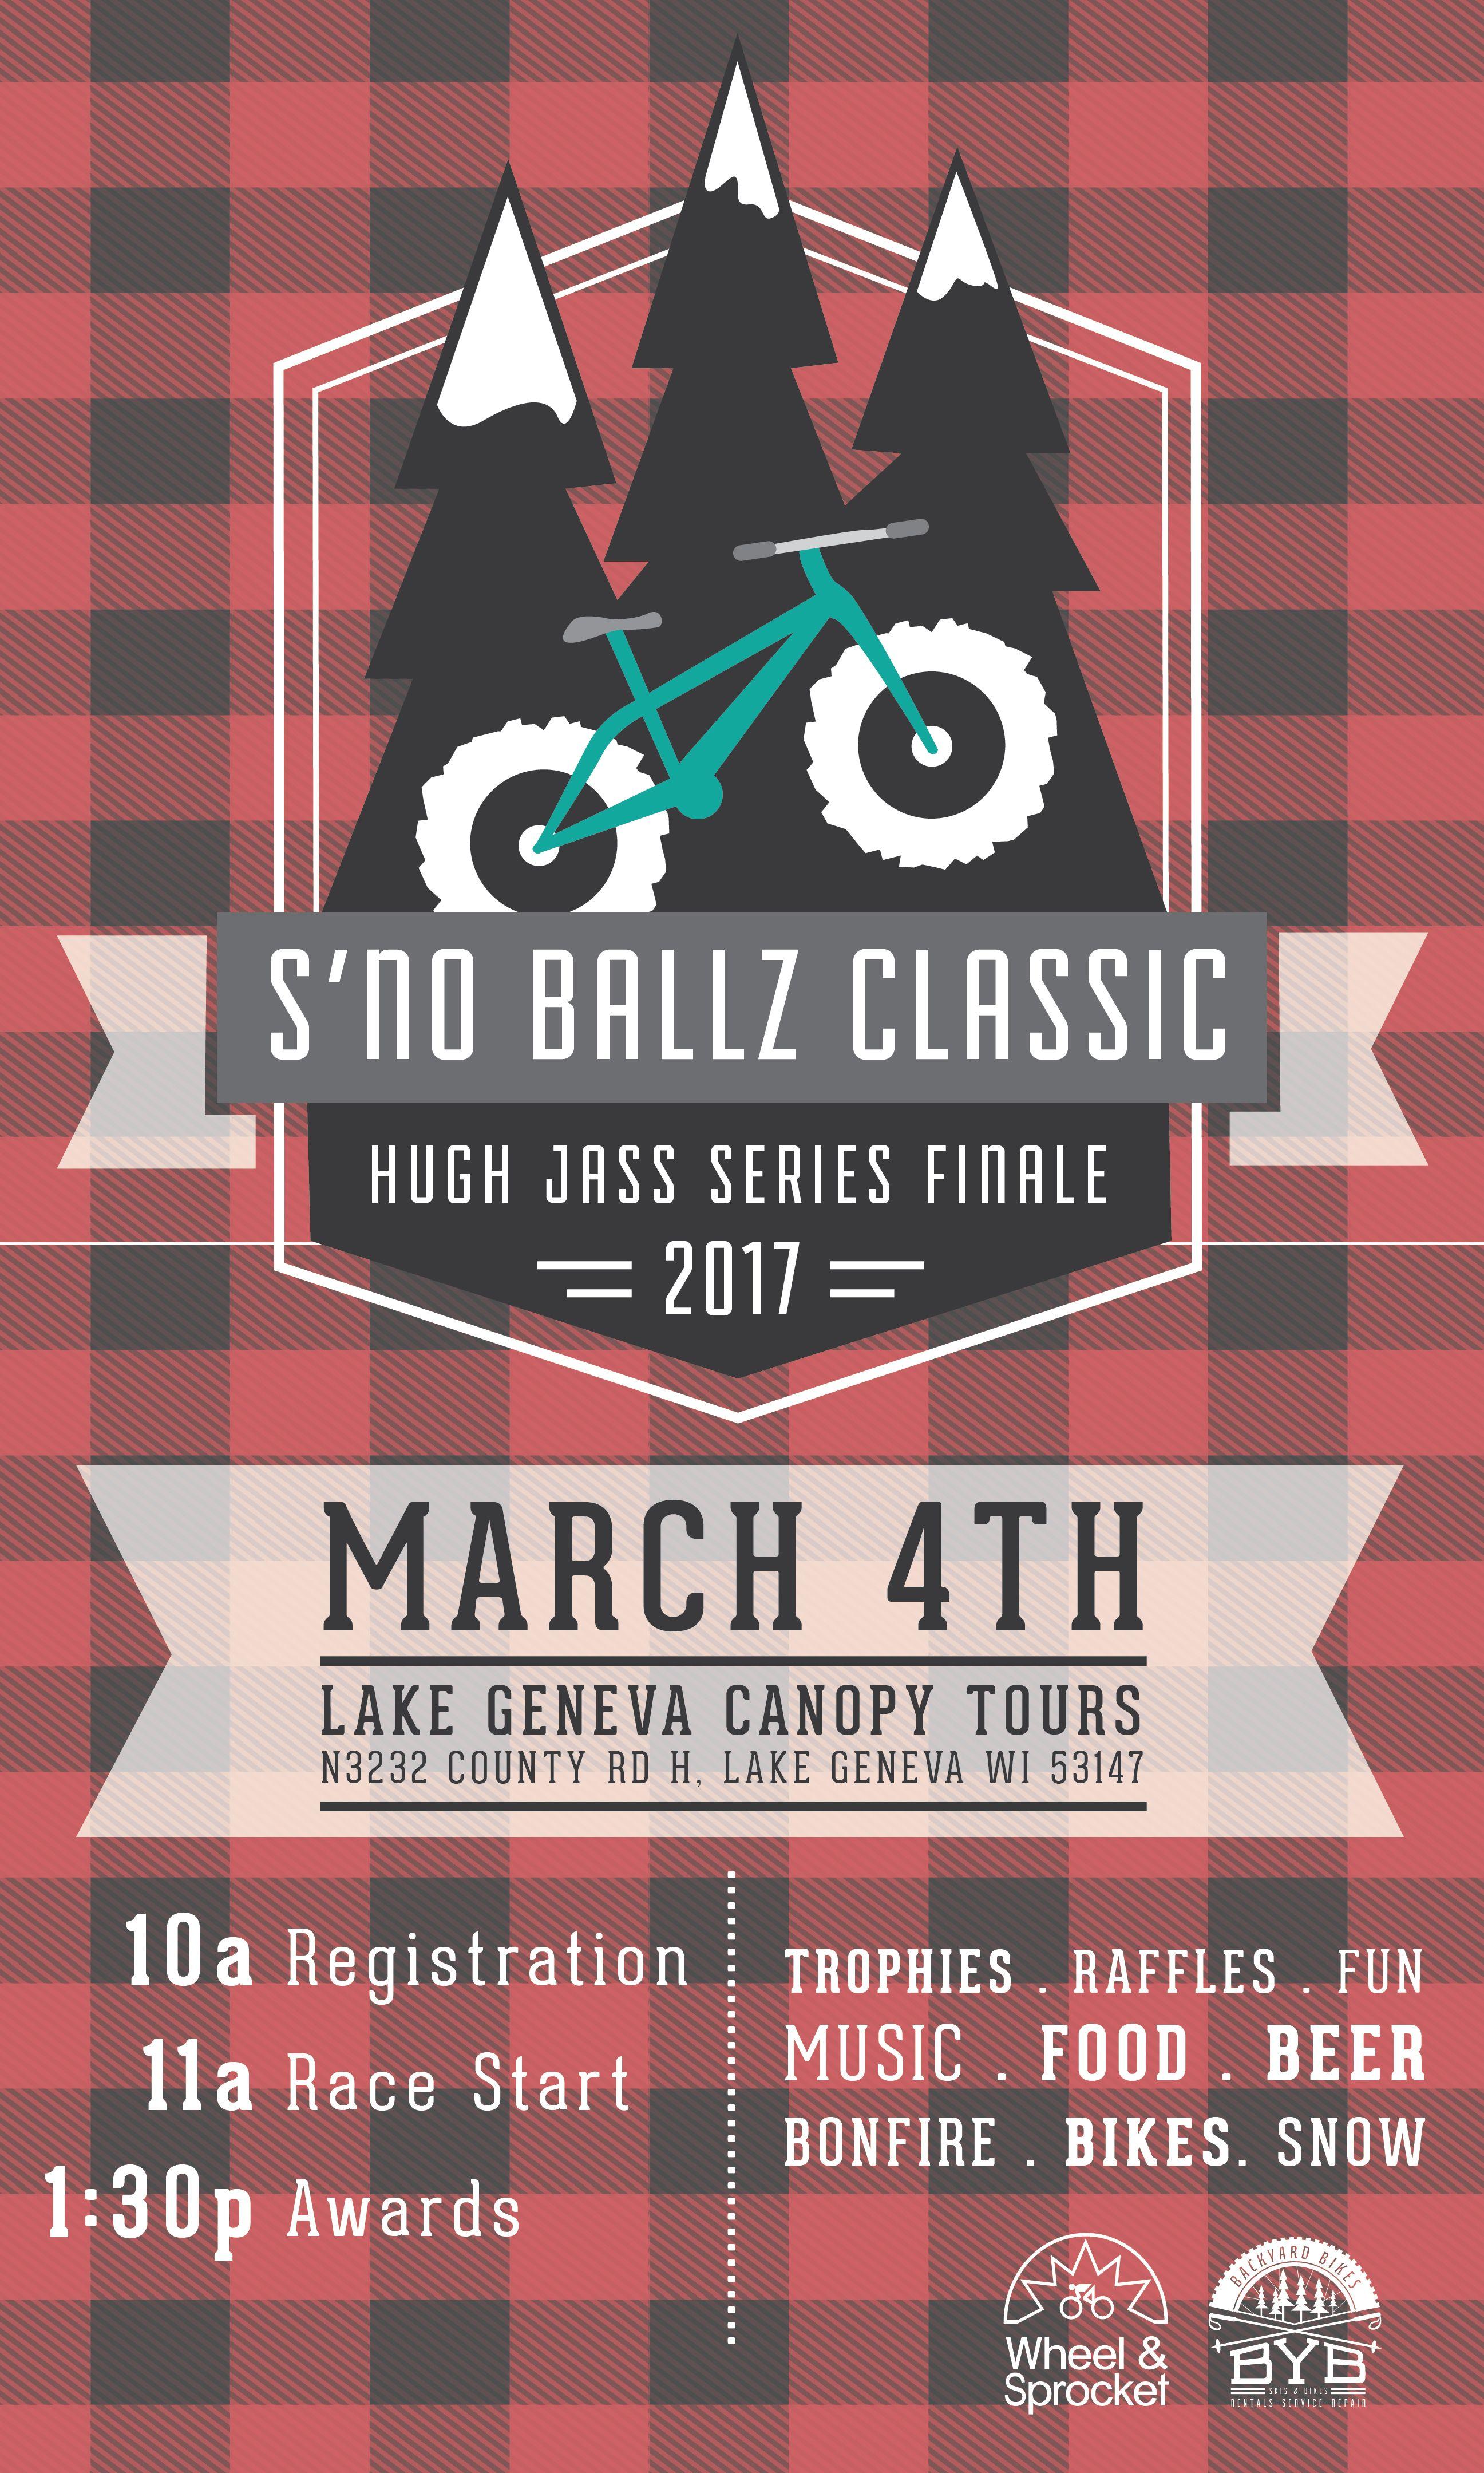 Fat Bike Race Hugh Jass Finale At Lake Geneva Canopy Tours WI